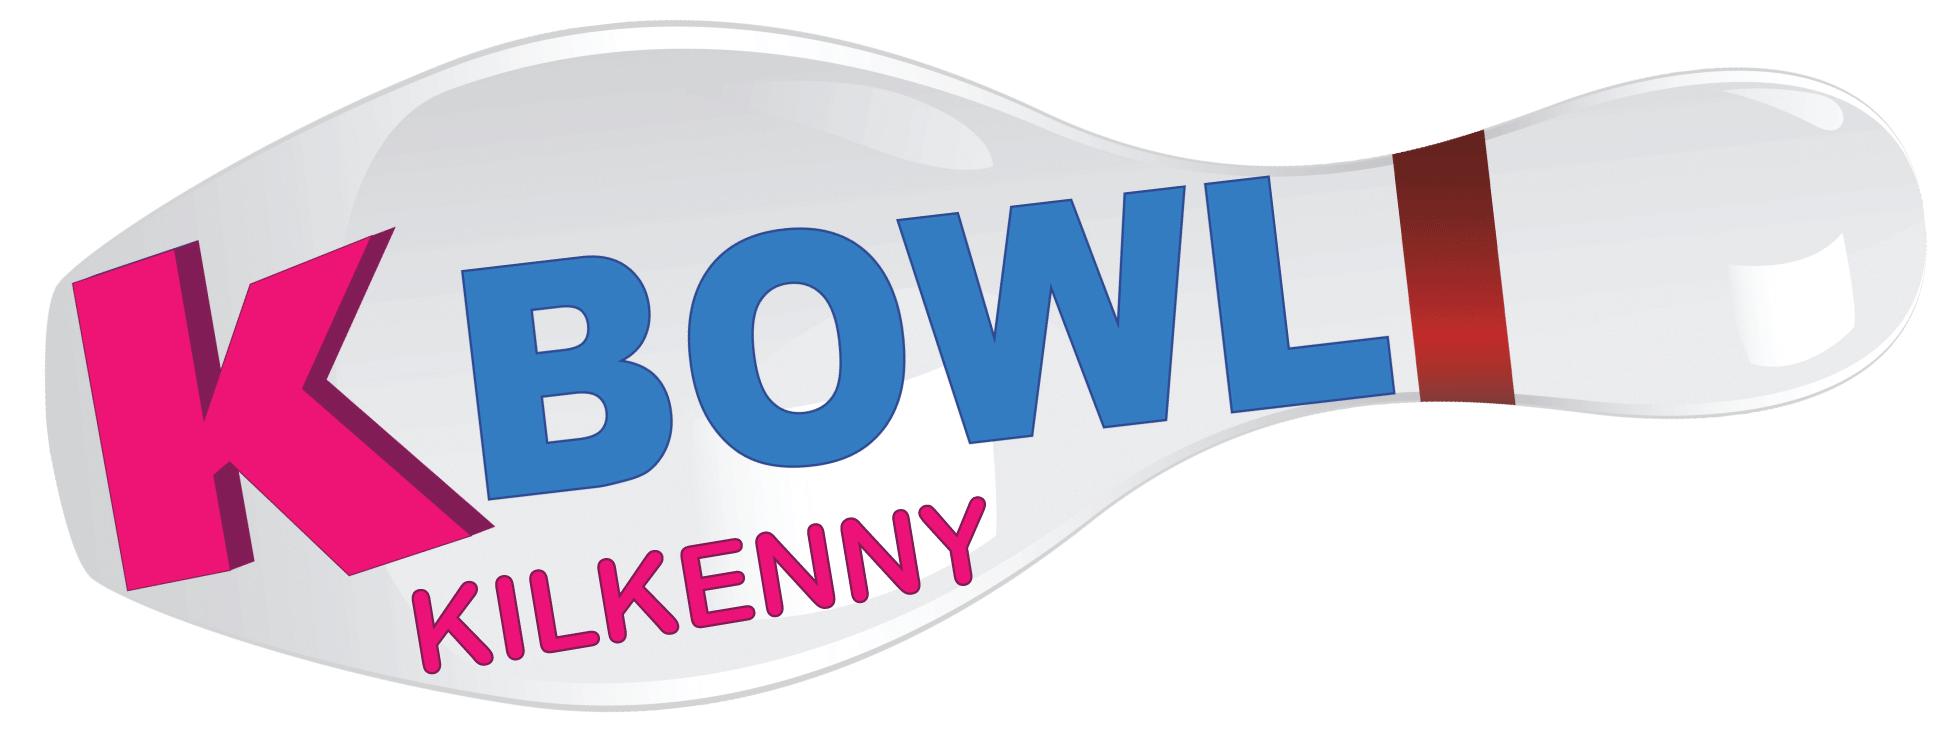 Kbowl Kilkenny